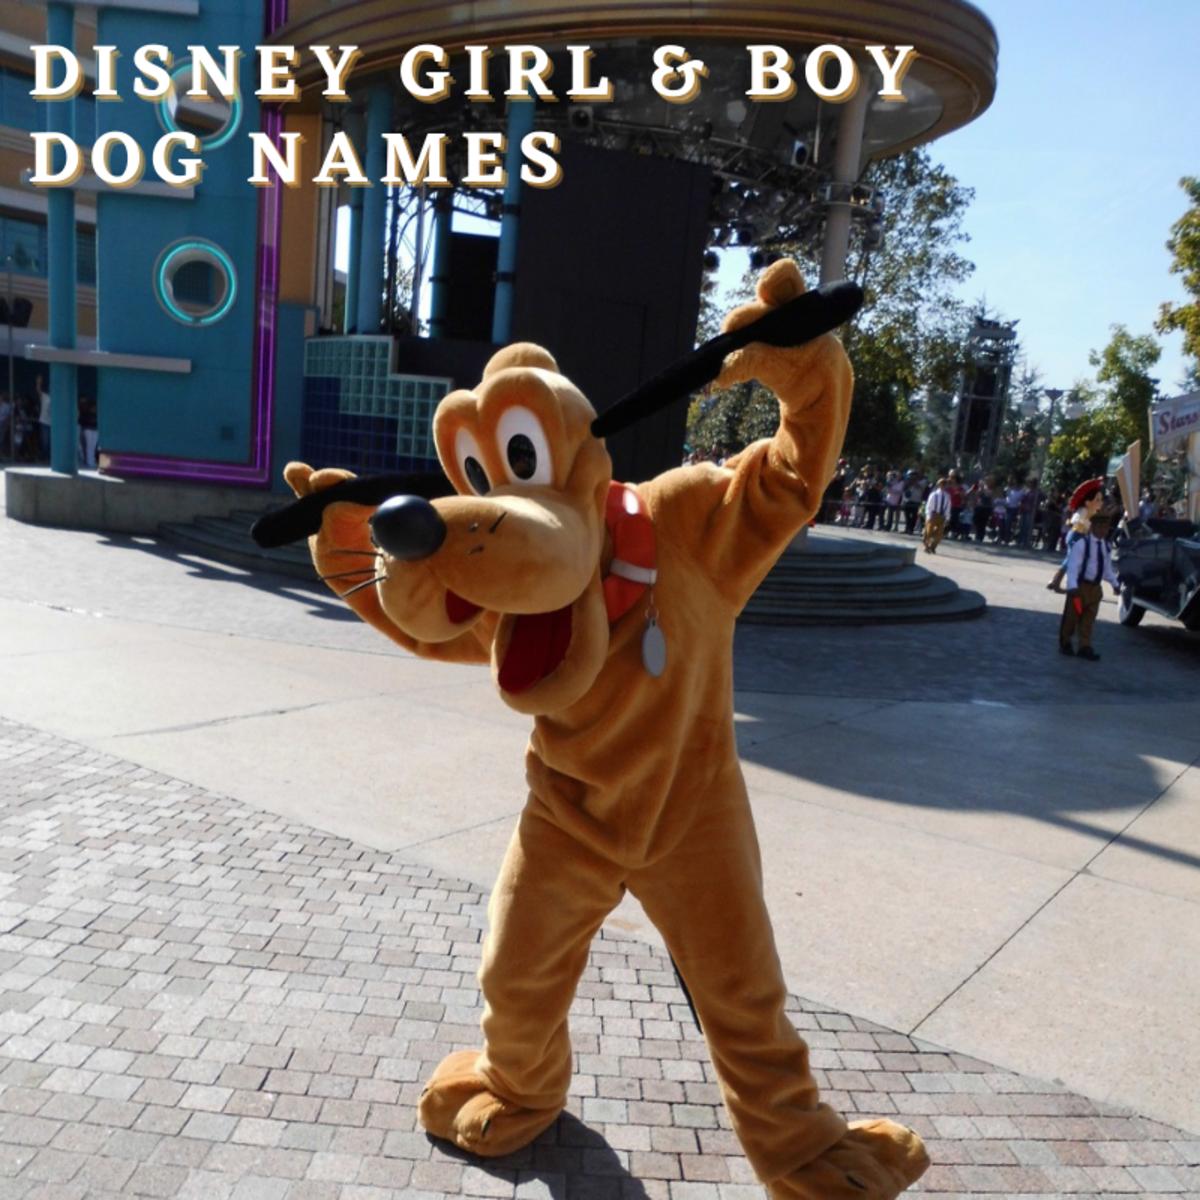 Disney Girl and Boy Dog Names